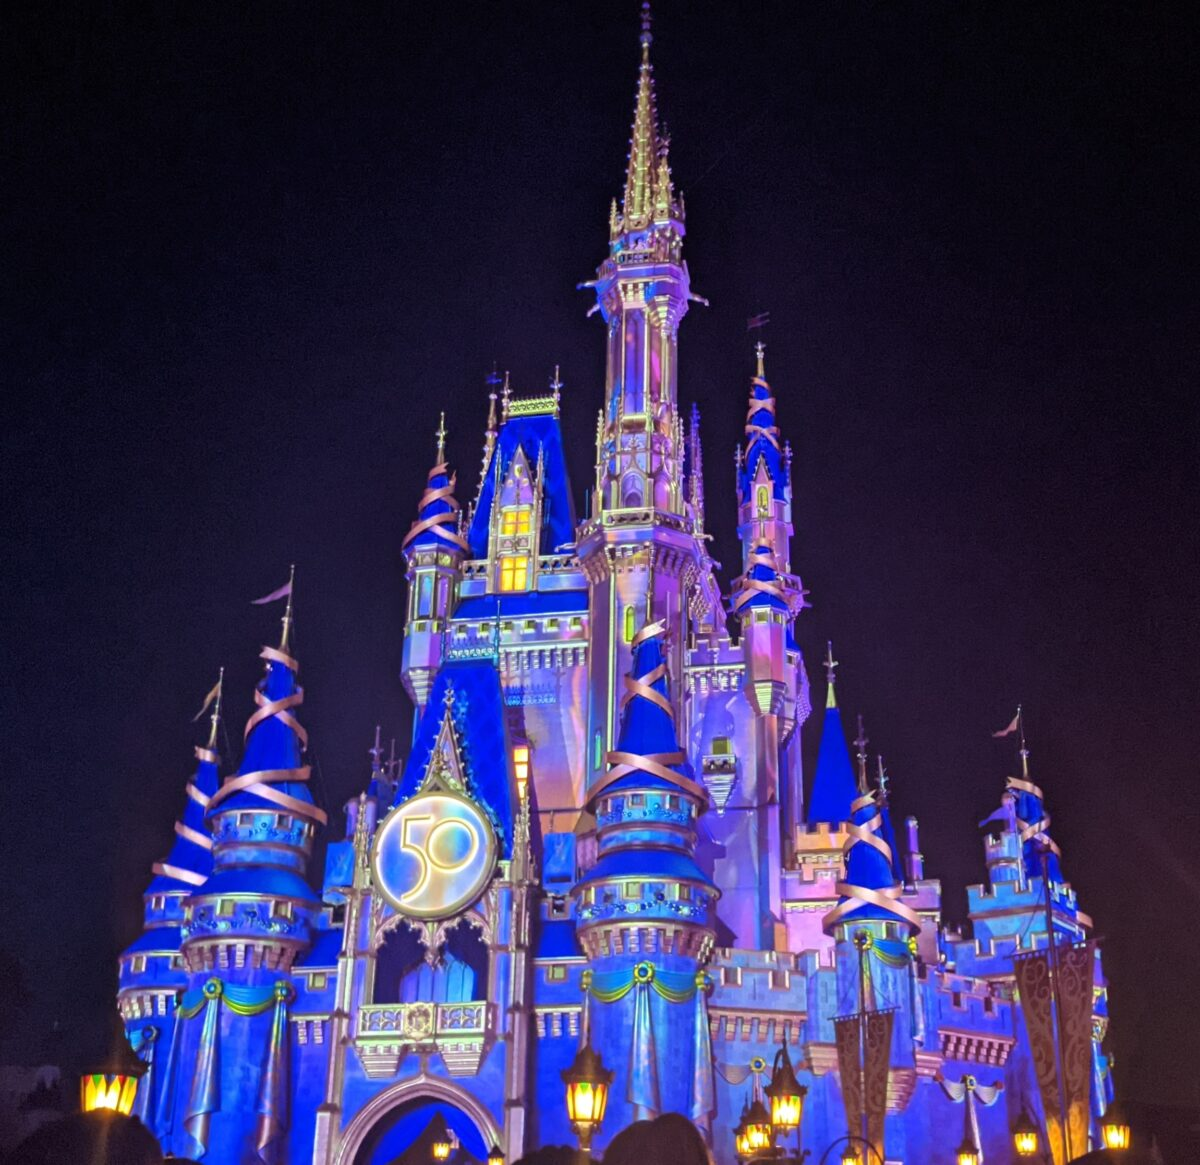 Magic Kingdom Cinderella Castle 50th Anniversary Celebration at Walt Disney World